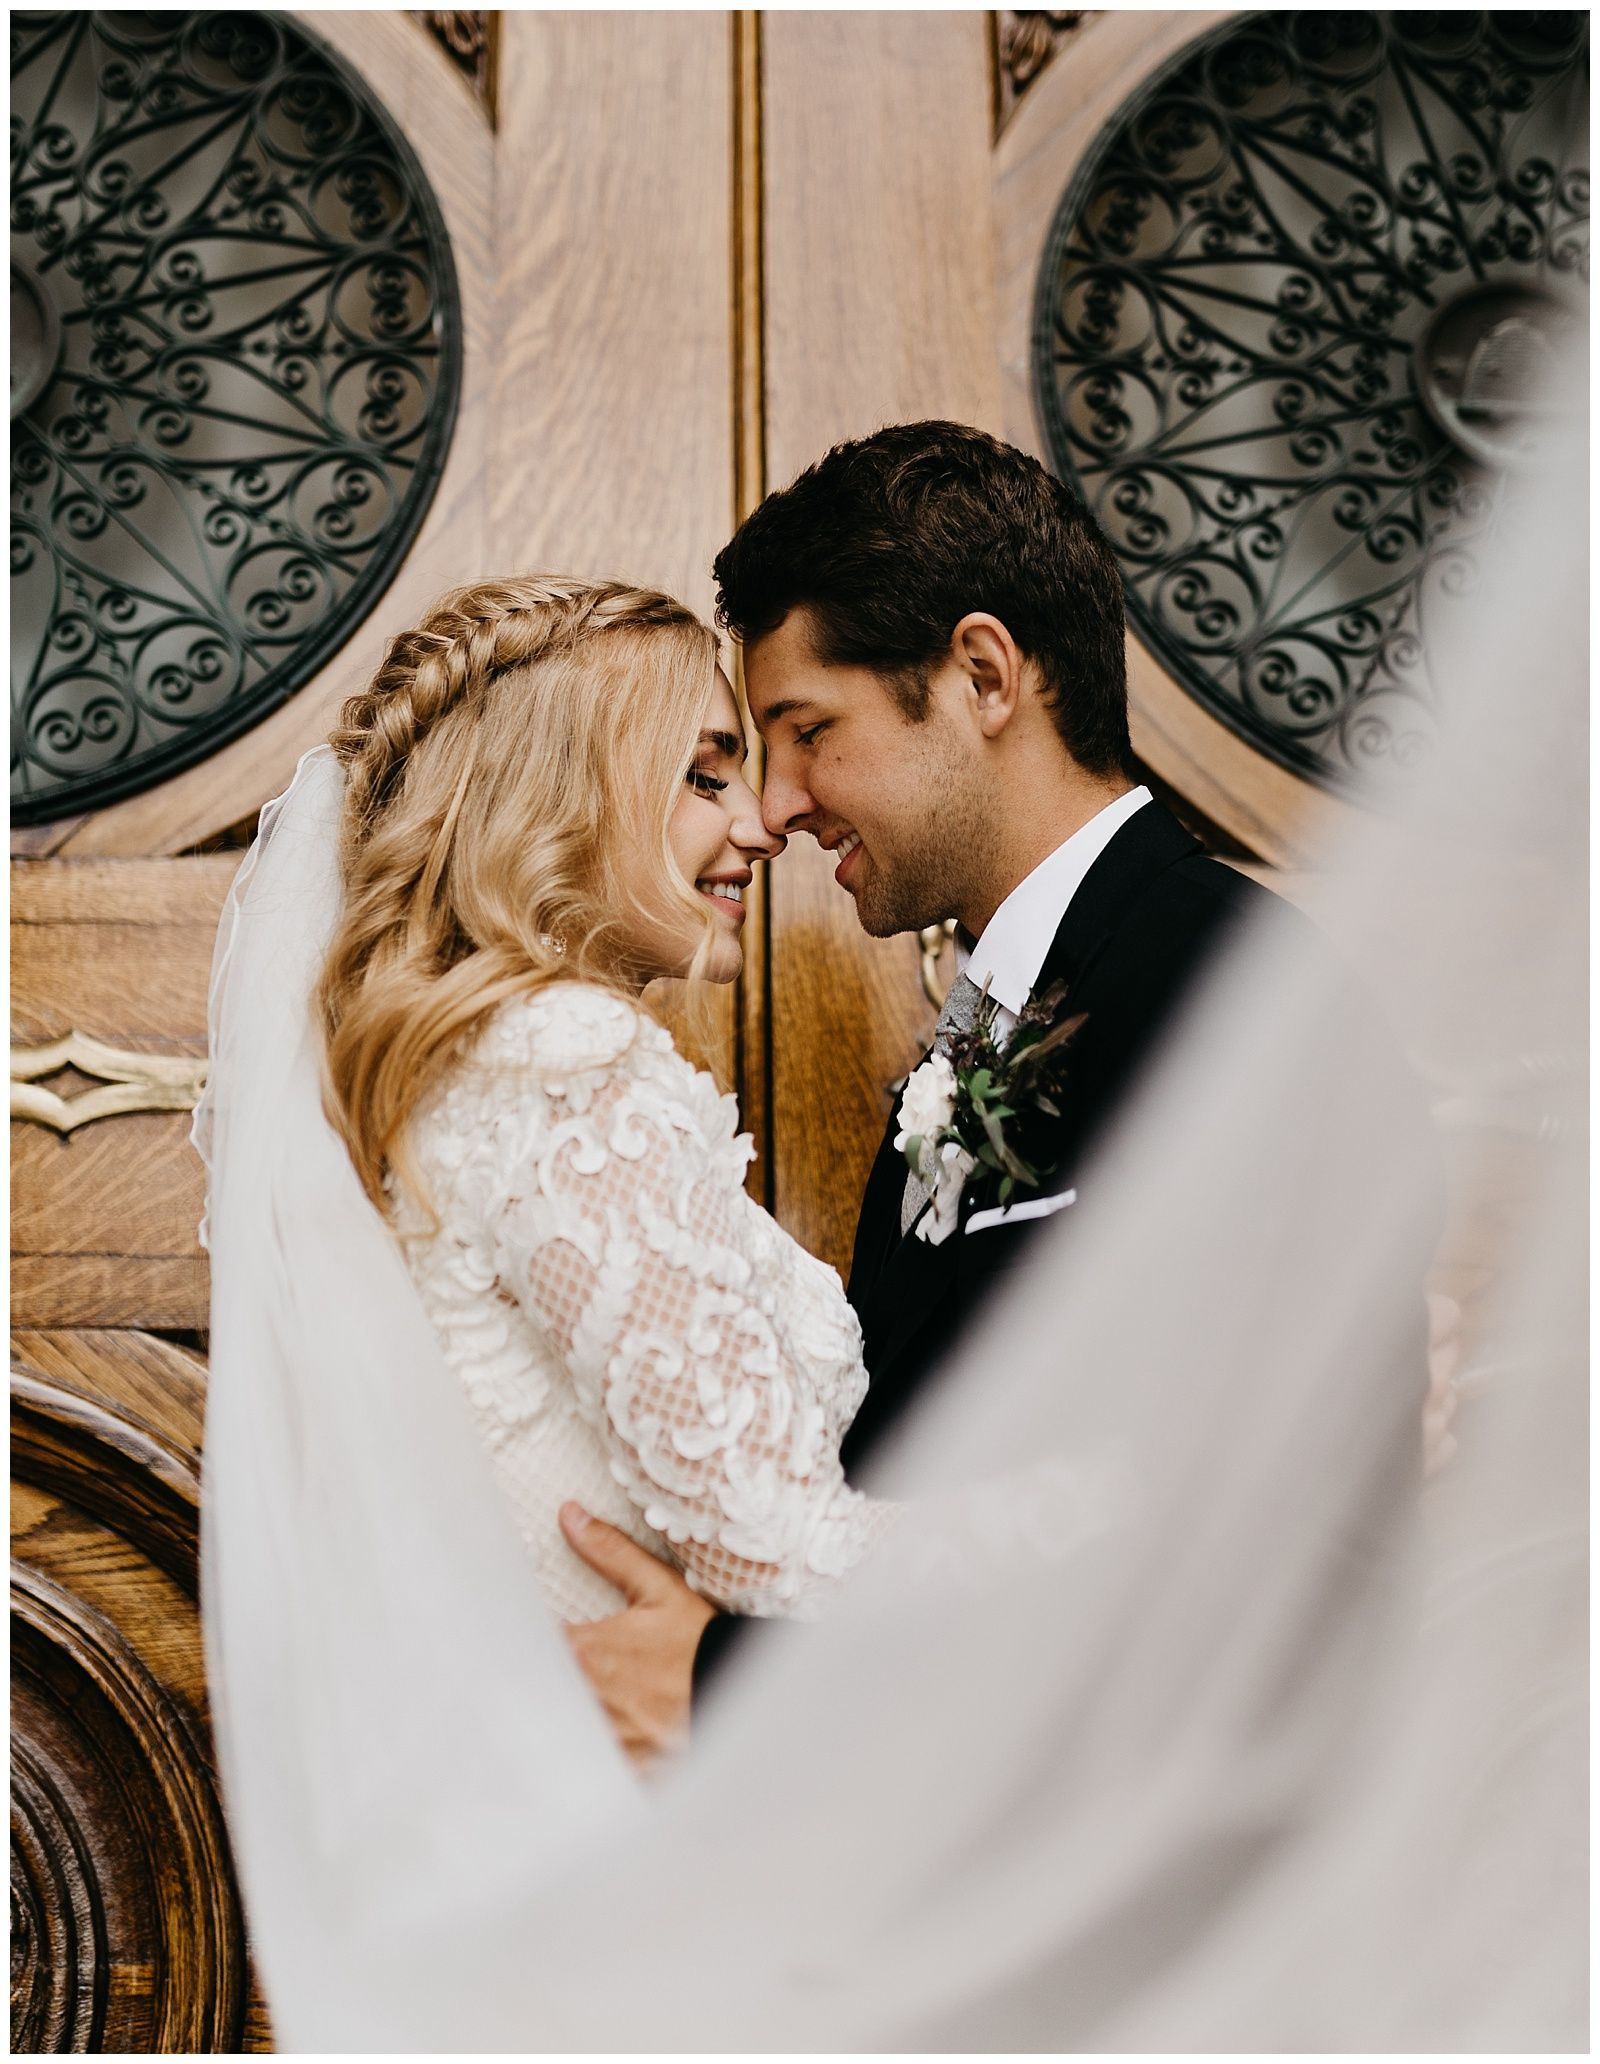 Madeline And Logan Salt Lake Temple Copper Nickel Wedding